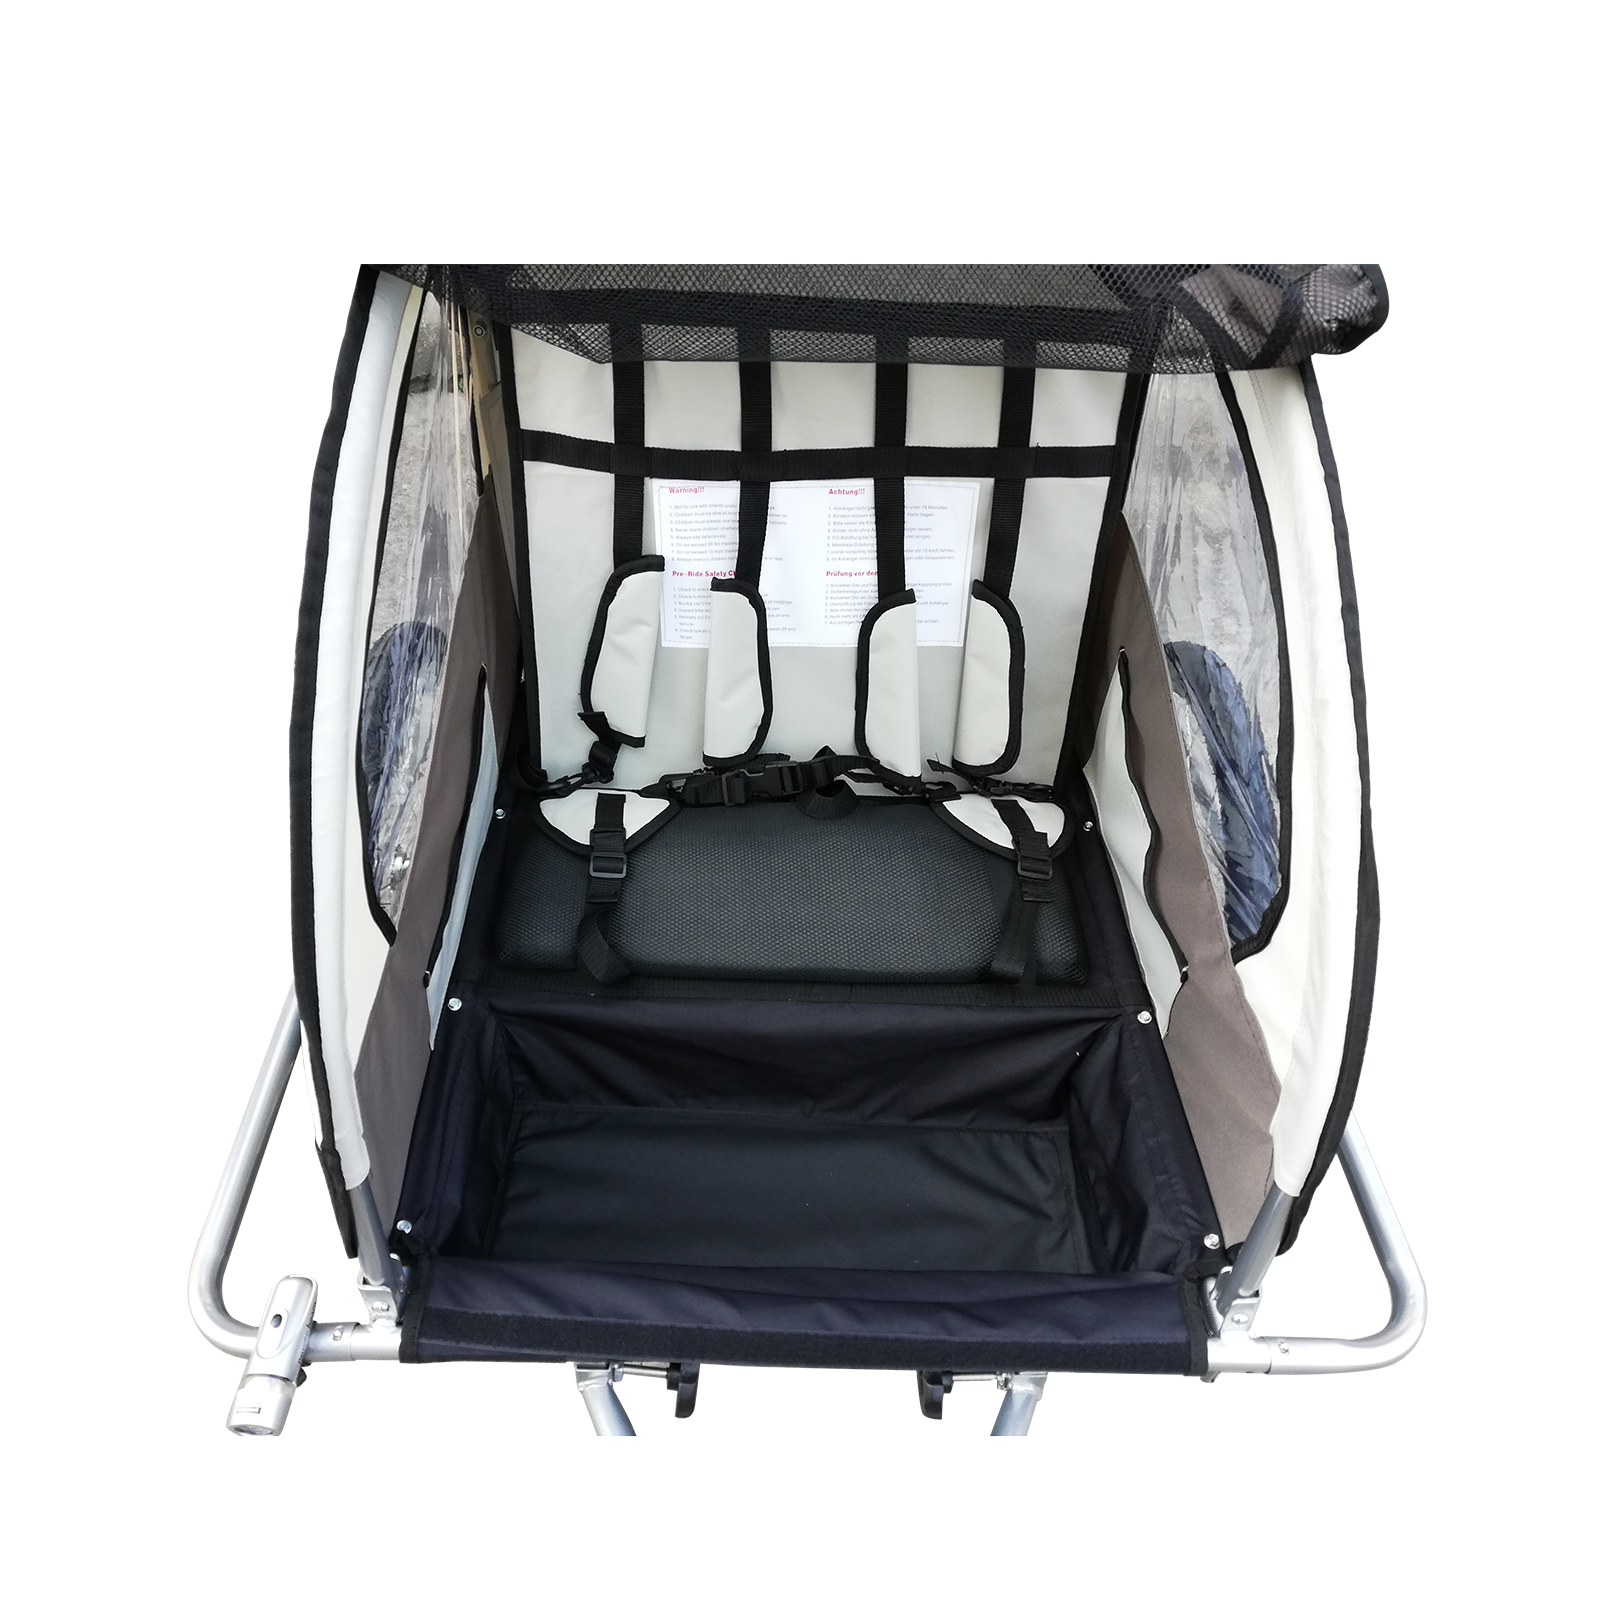 Remolque-Infantil-Bicicleta-2-PLAZAS-Kit-Footing-Rueda-360-Amortiguadores-Barra miniatura 22